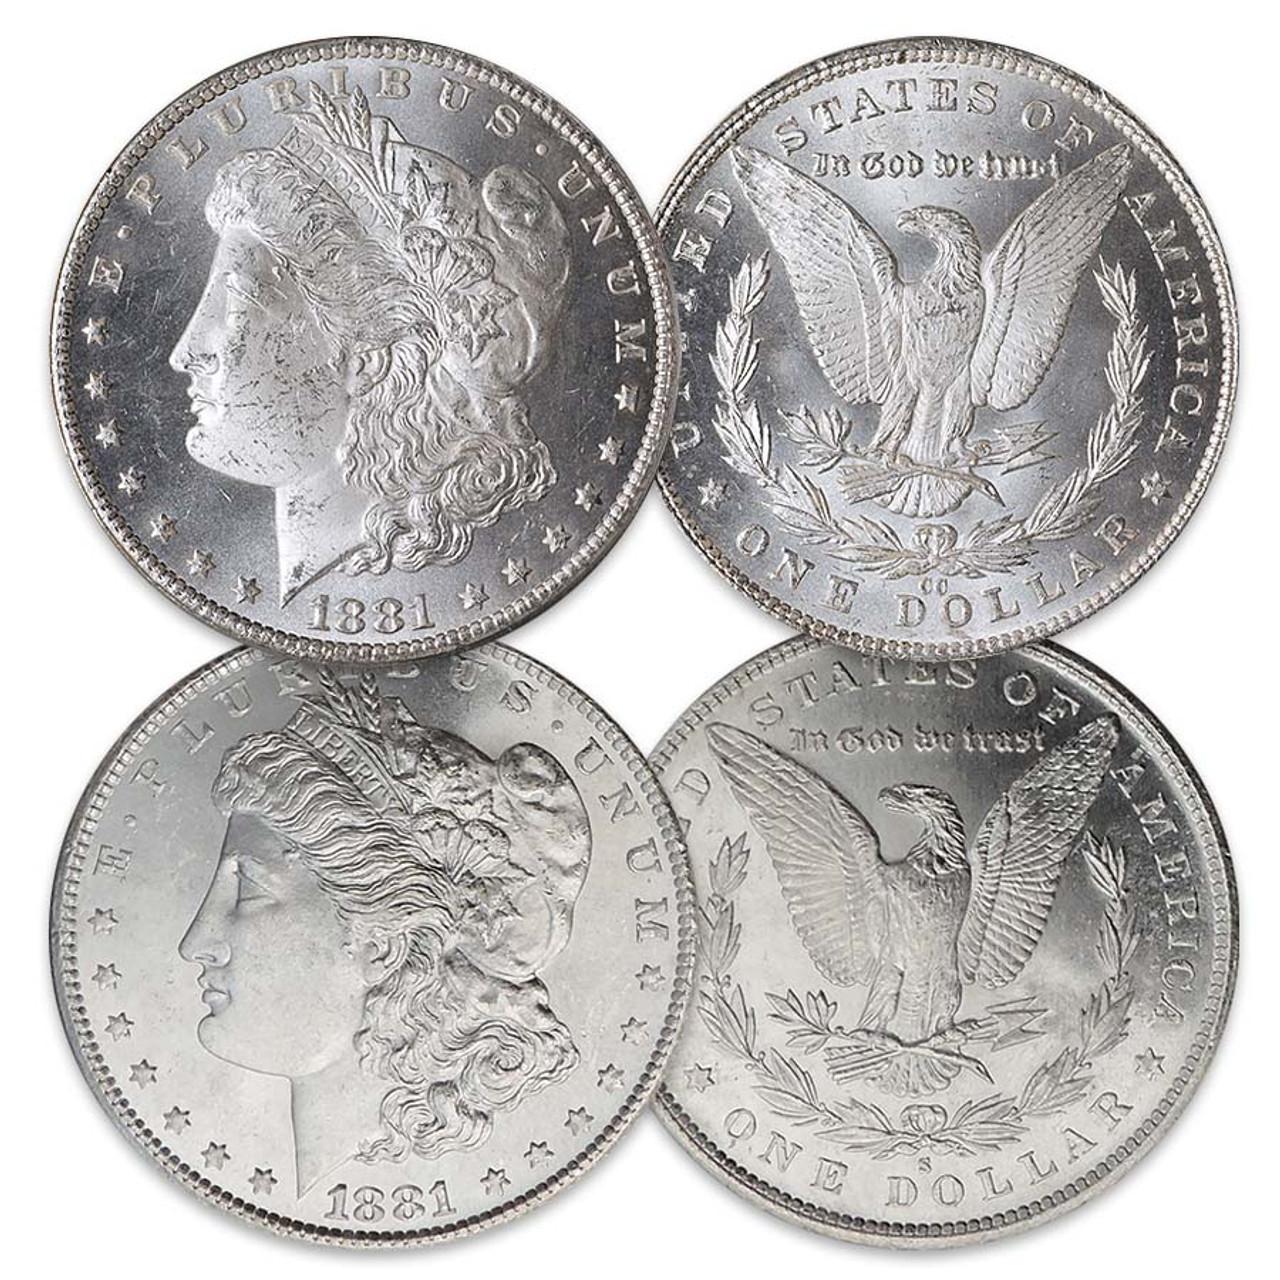 1881-CC Morgan Silver Dollar Brilliant Uncirculated with FREE Morgan Silver Dollar